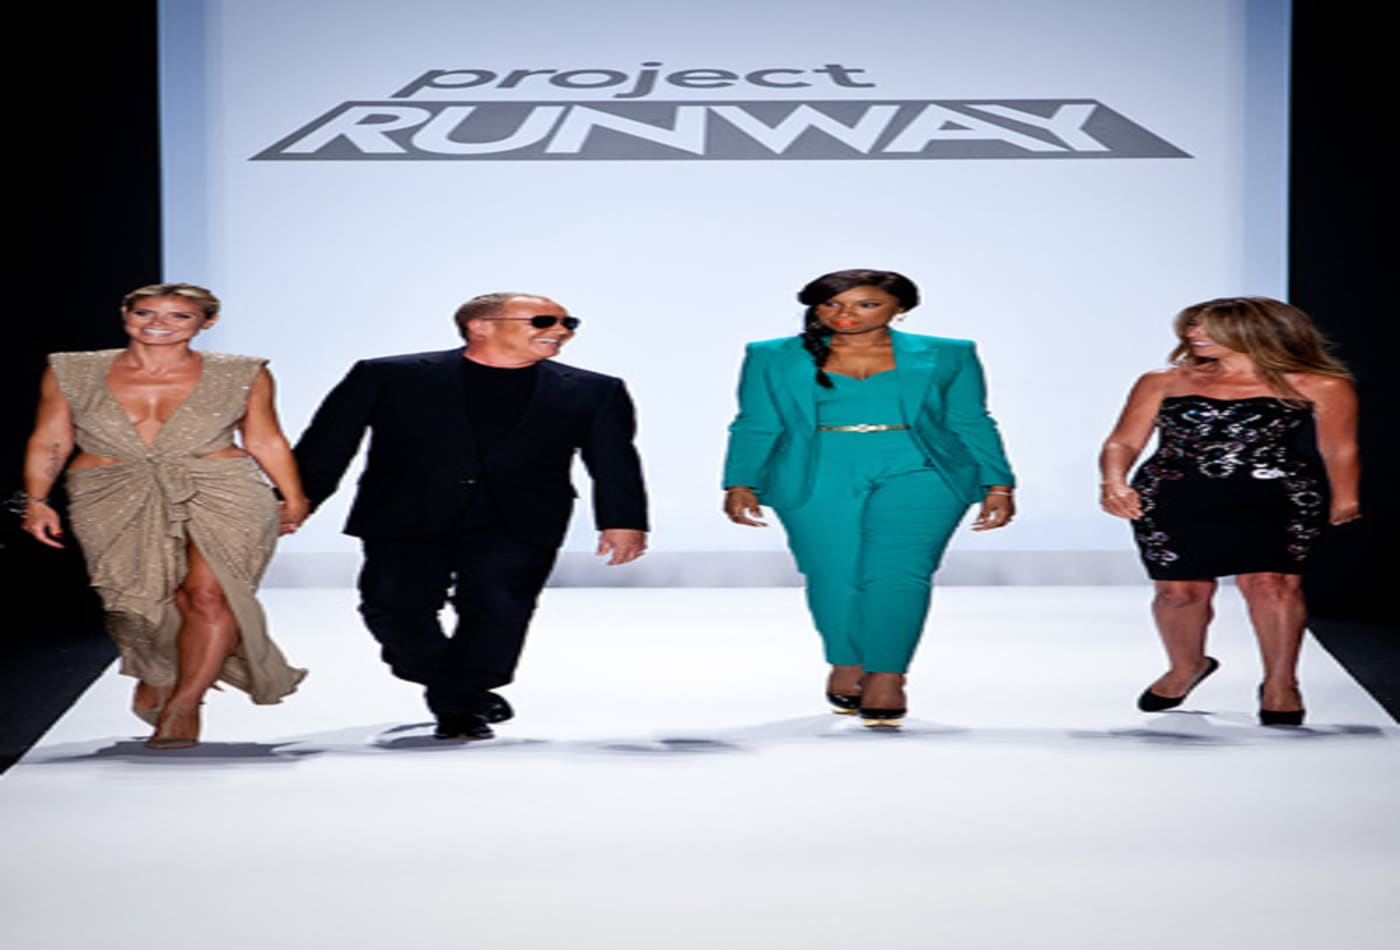 Mercedes-Benz-Fashion-week-2012-project-runway.jpg